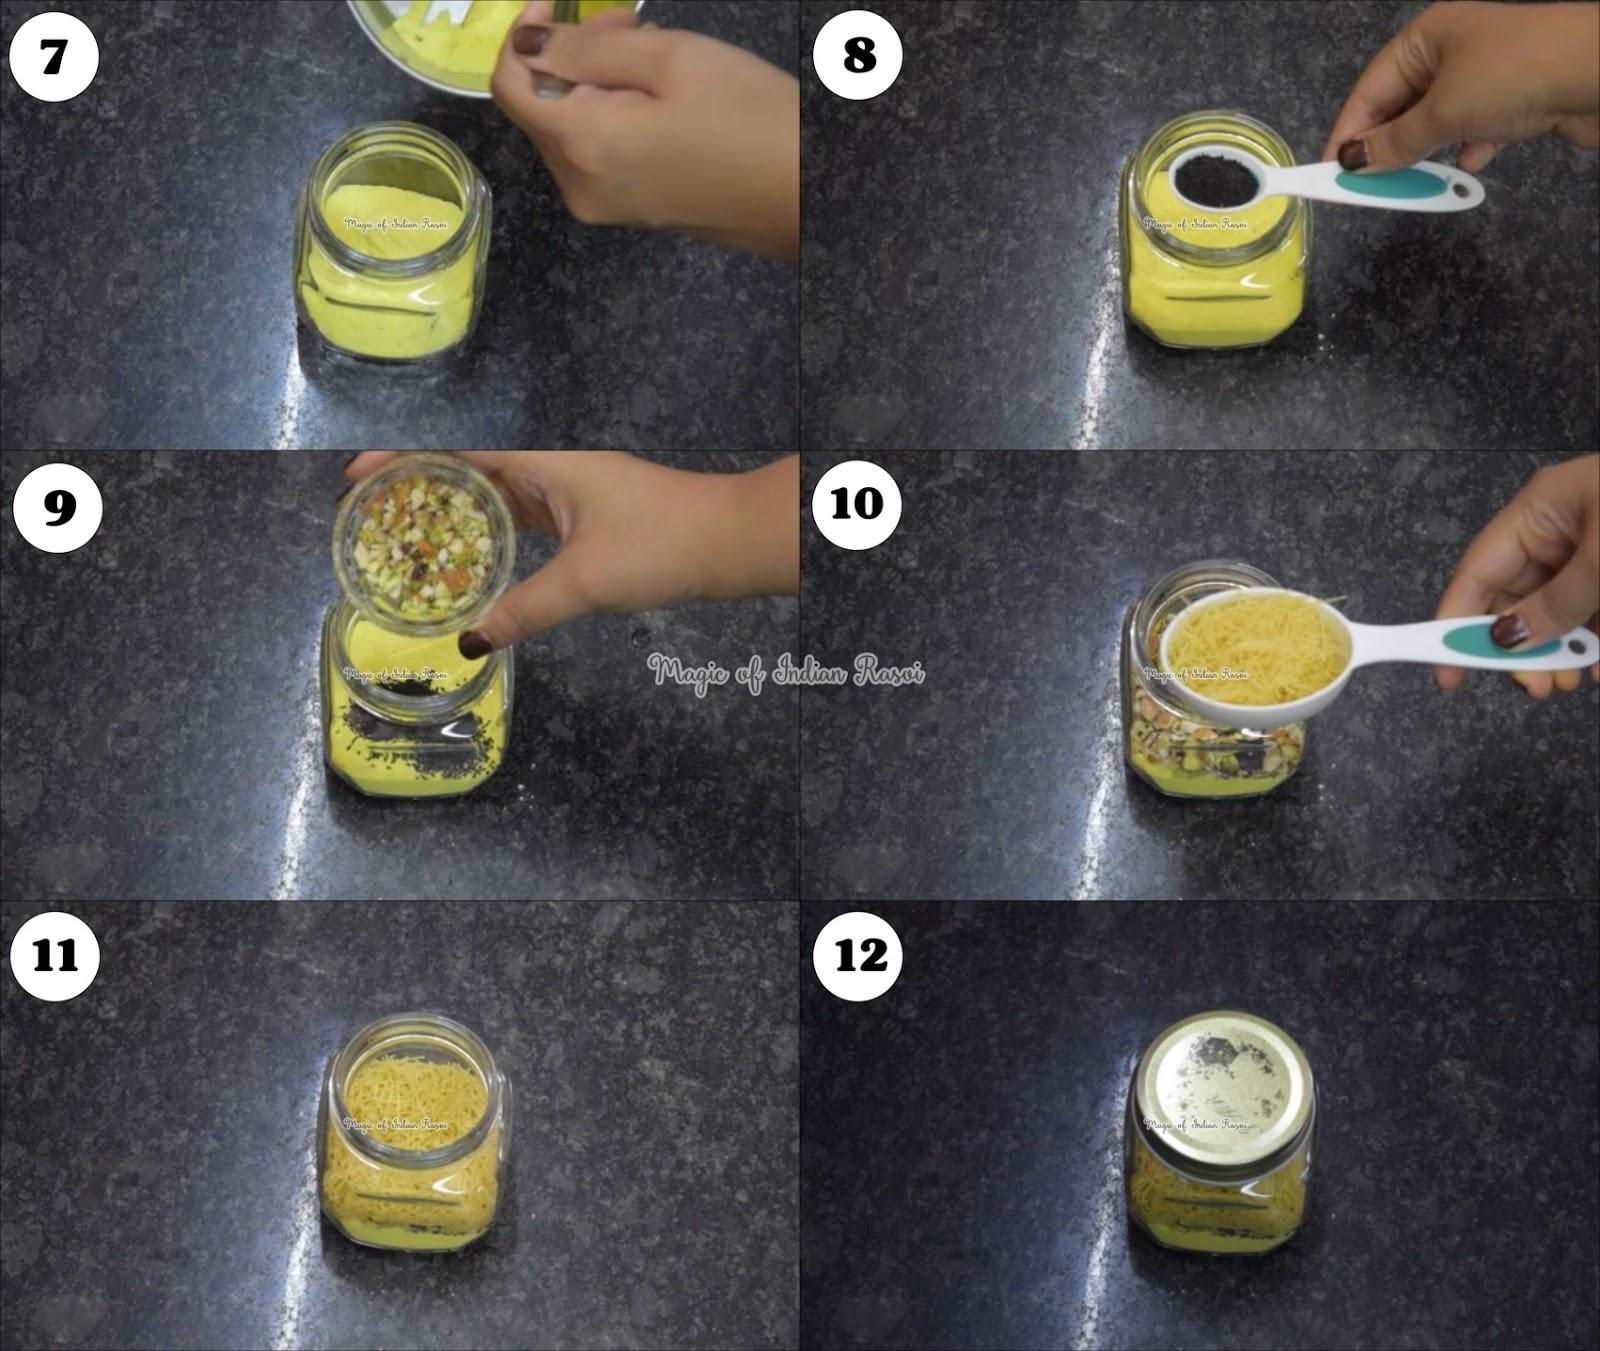 Kesar Pista Falooda Mix Recipe - केसर पिस्ता फालूदा मिक्स घर पर बनाये - Priya R - Magic of Indian Rasoi